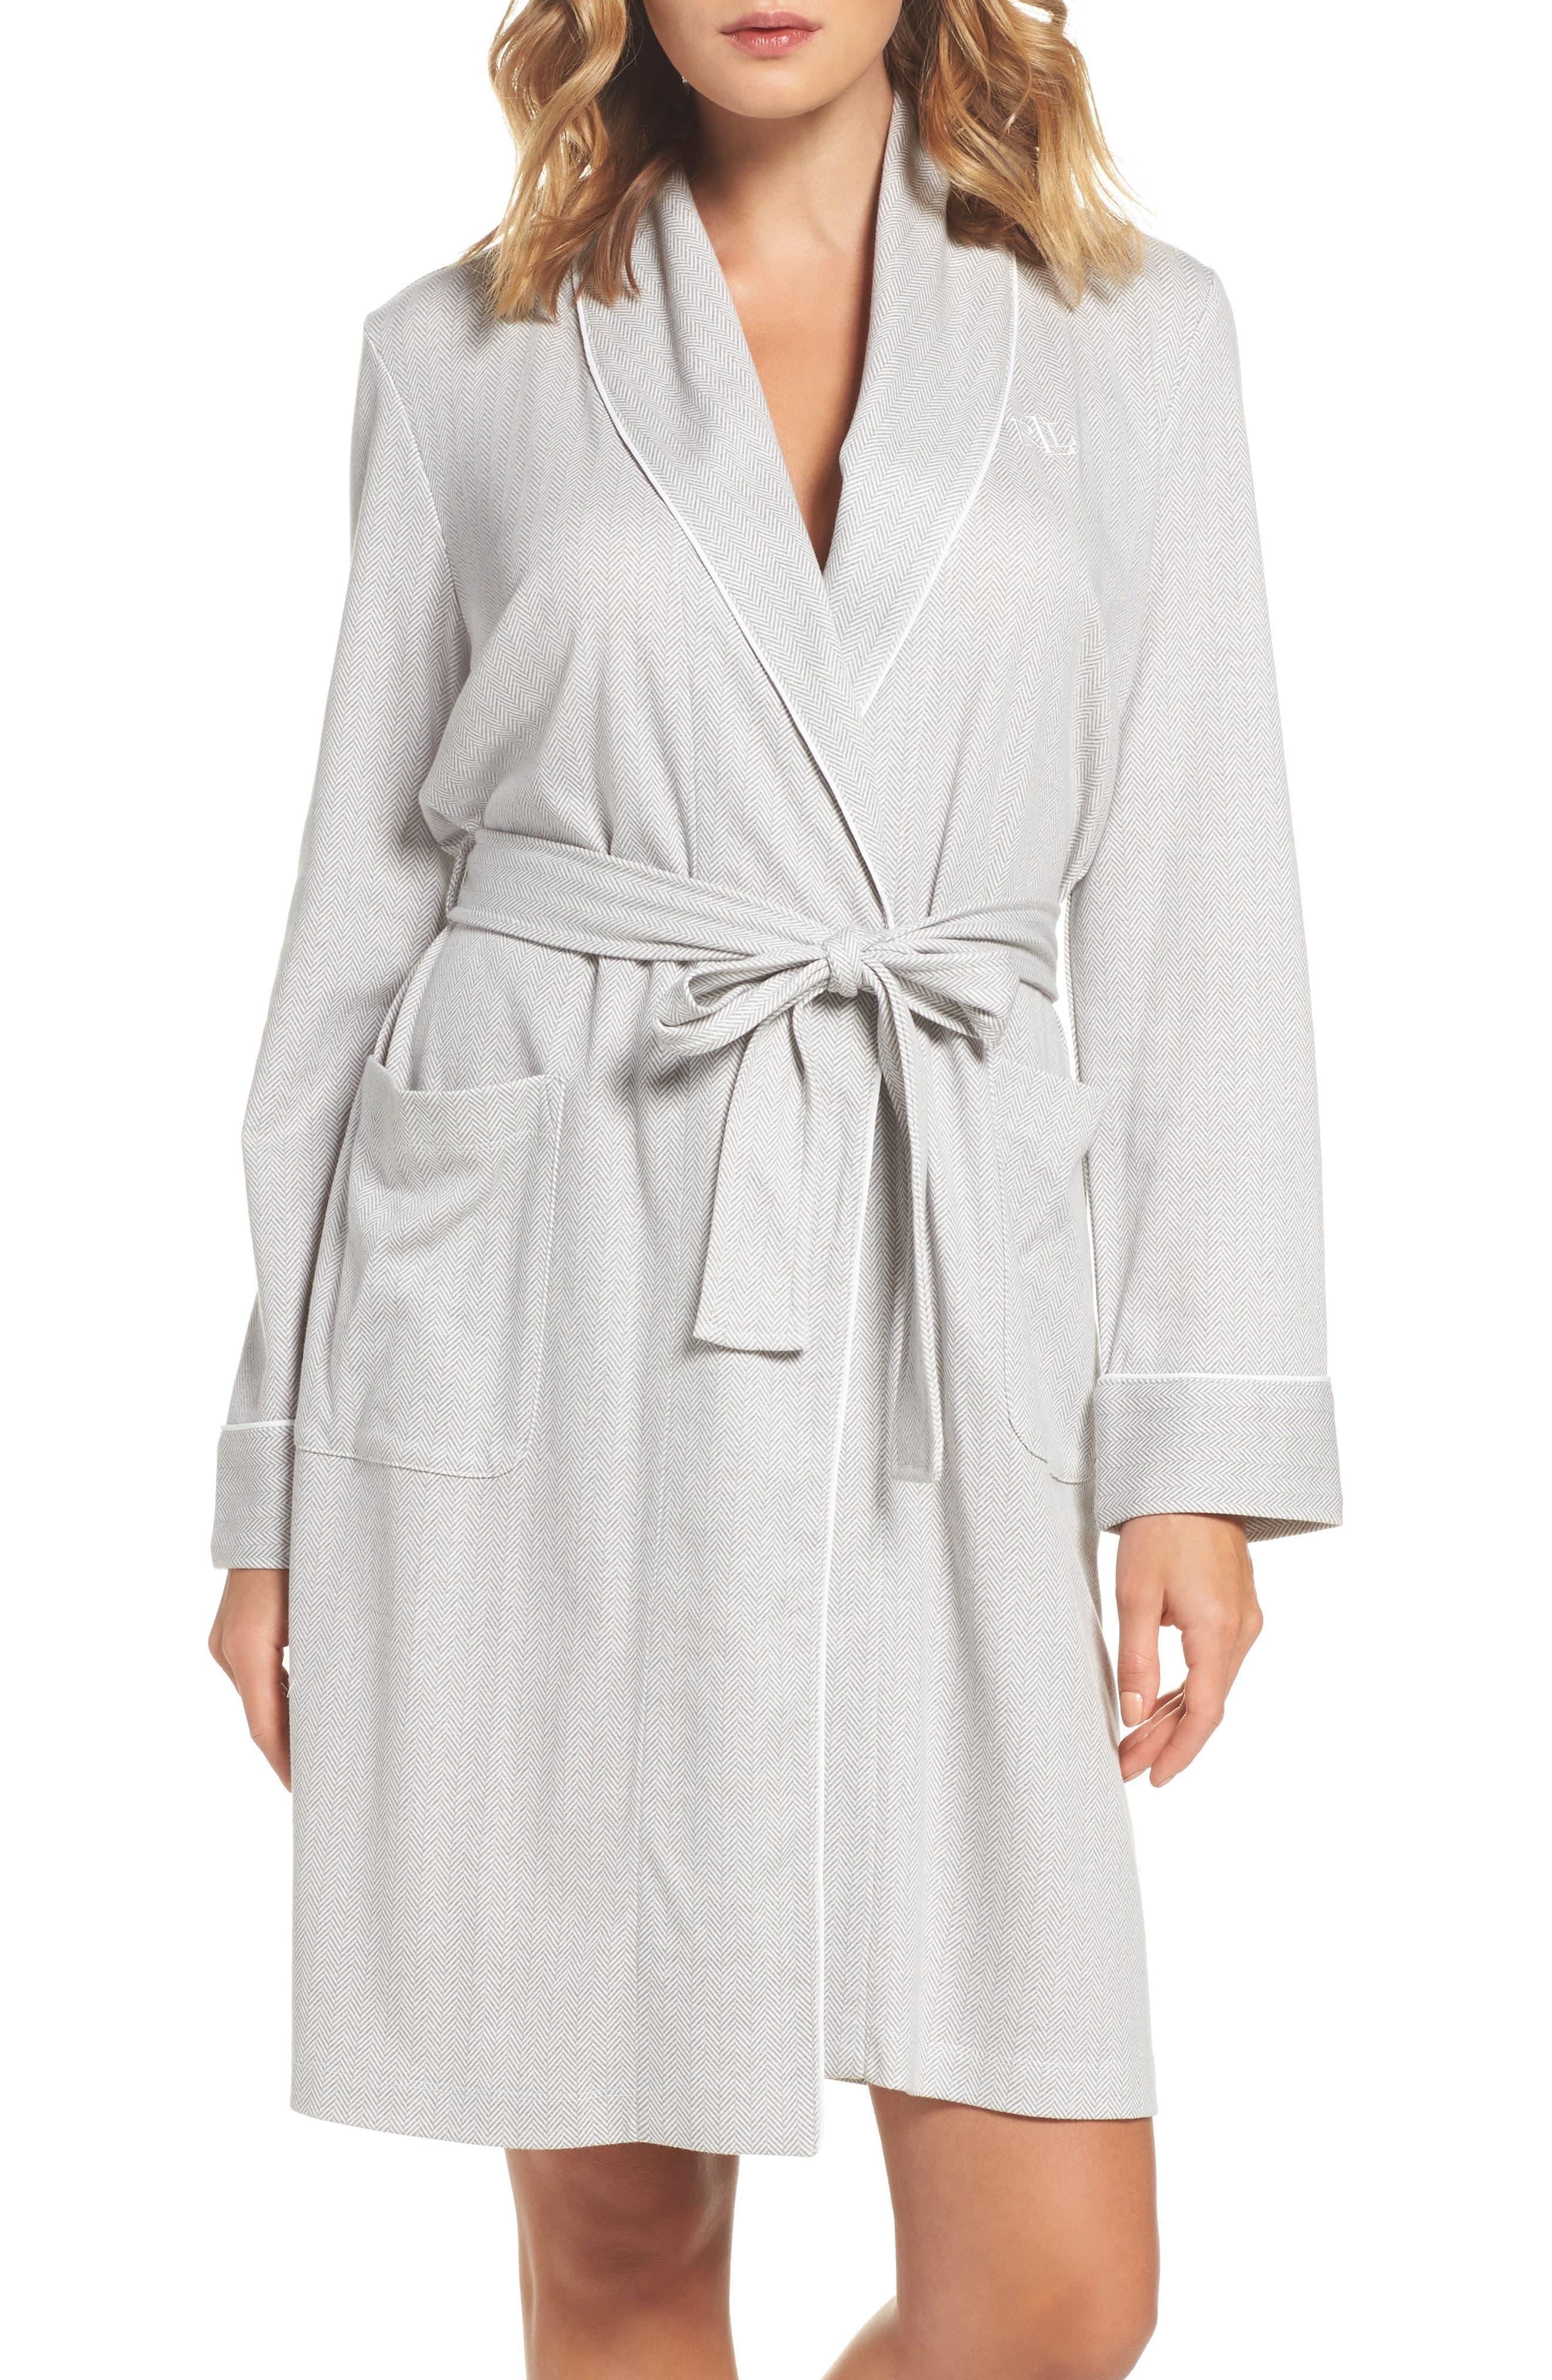 Short Robe,                         Main,                         color, 023